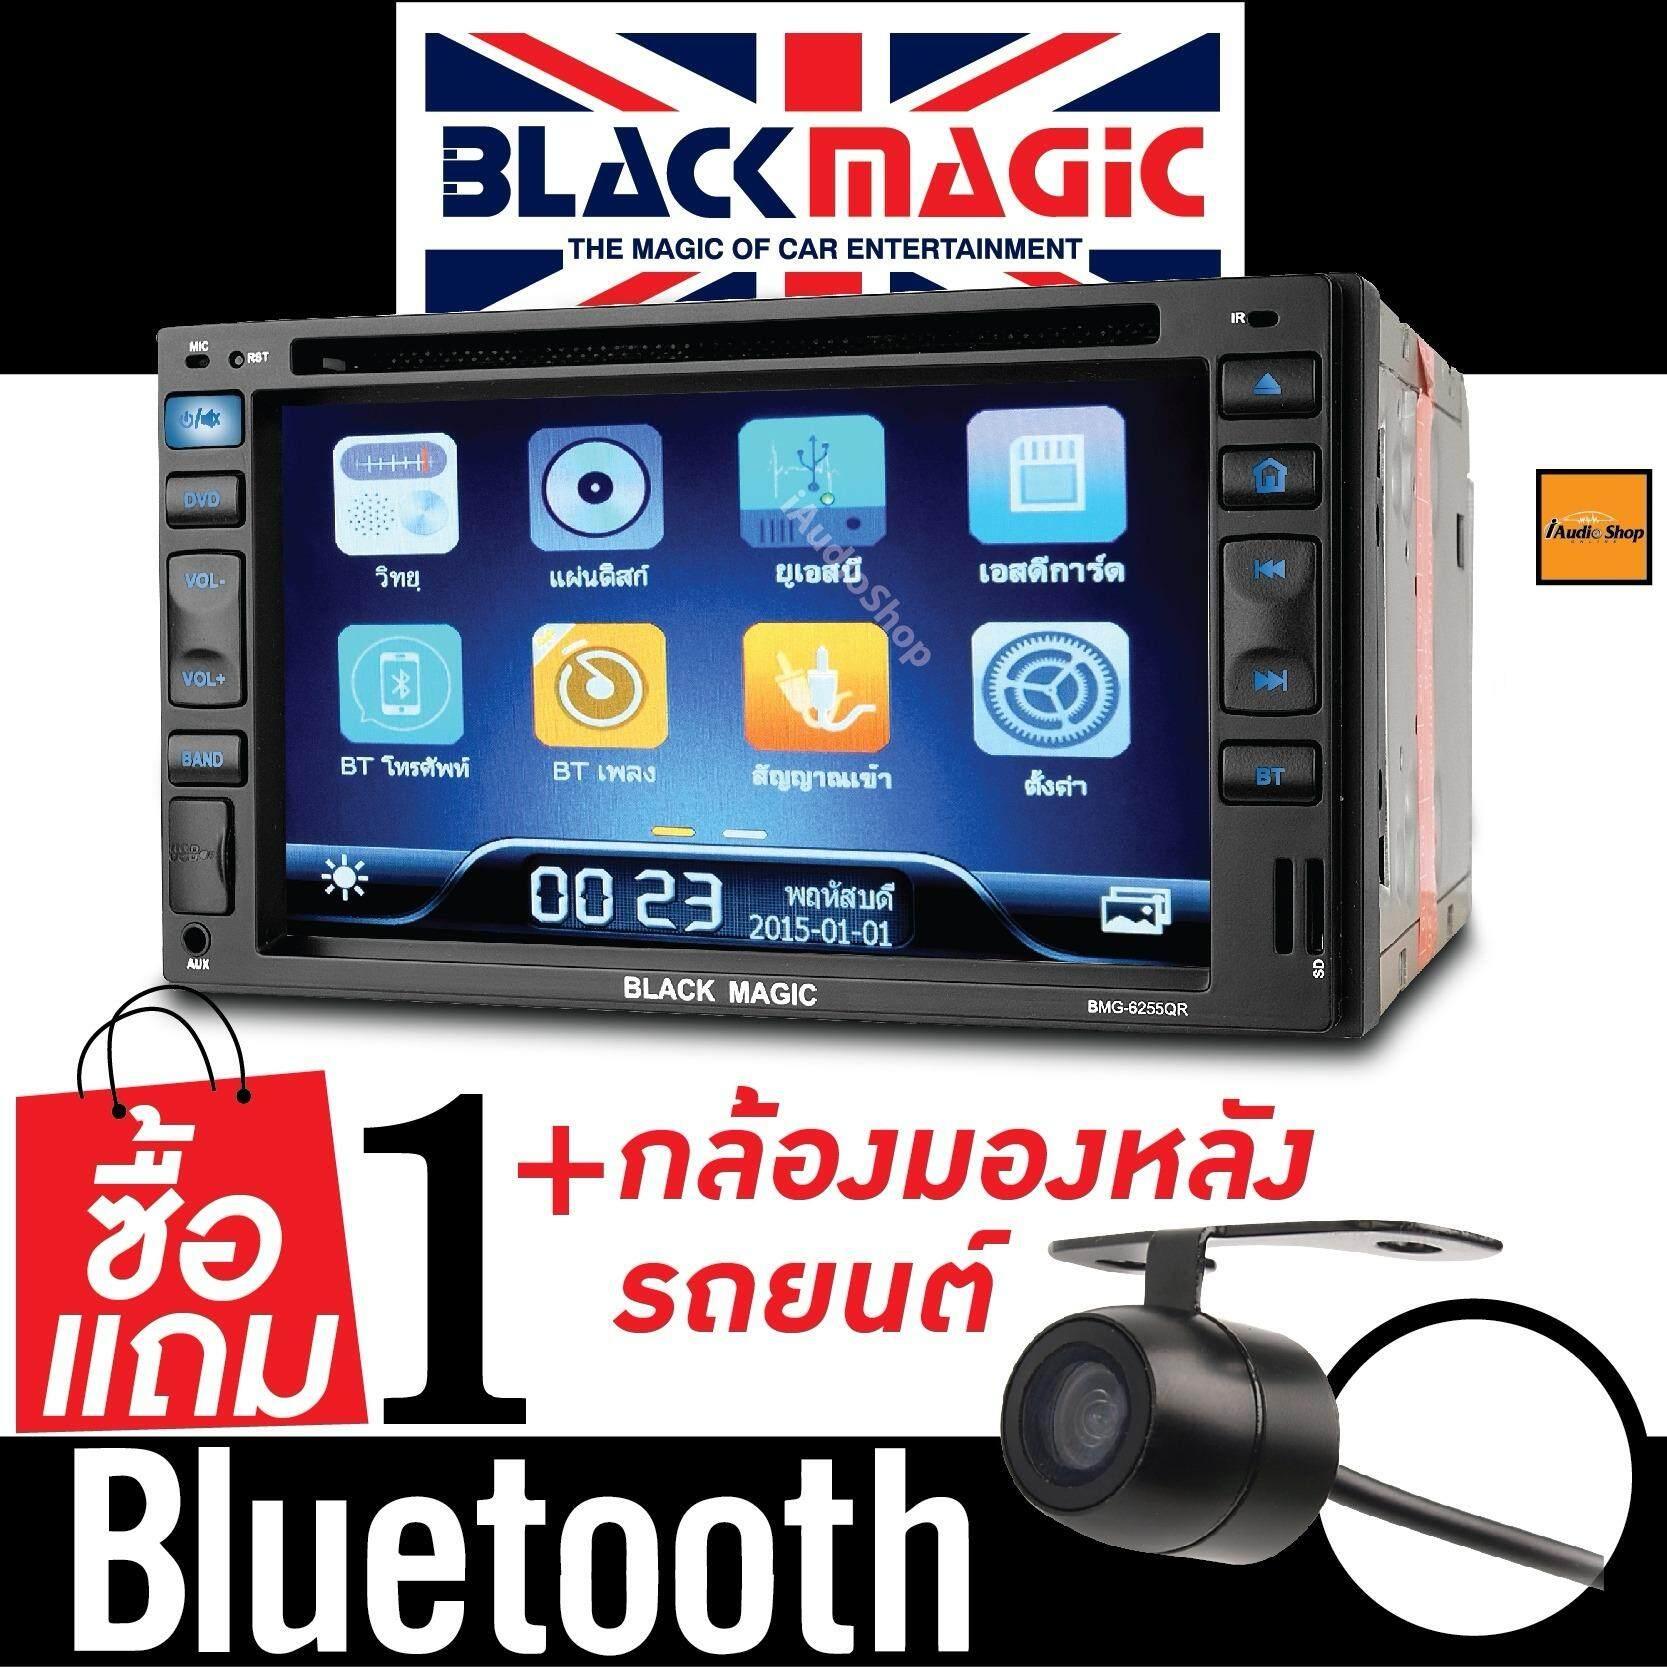 Black Magic วิทยุติดรถยนต์ จอติดรถยนต์ จอ2ดิน จอ2Din เครื่องเล่นติดรถยนต์ เครื่องเสียงรถยนต์ ตัวรับสัญญาณแบบสเตอริโอ แบบ 2Din ขนาด6 5นิ้ว กล้องมองหลัง Smartcam Smc002 อย่างดี กลางวันชัดแจ๋ว กลางคืนชัดเป๊ะ มีเส้นบอกระยะ เป็นต้นฉบับ